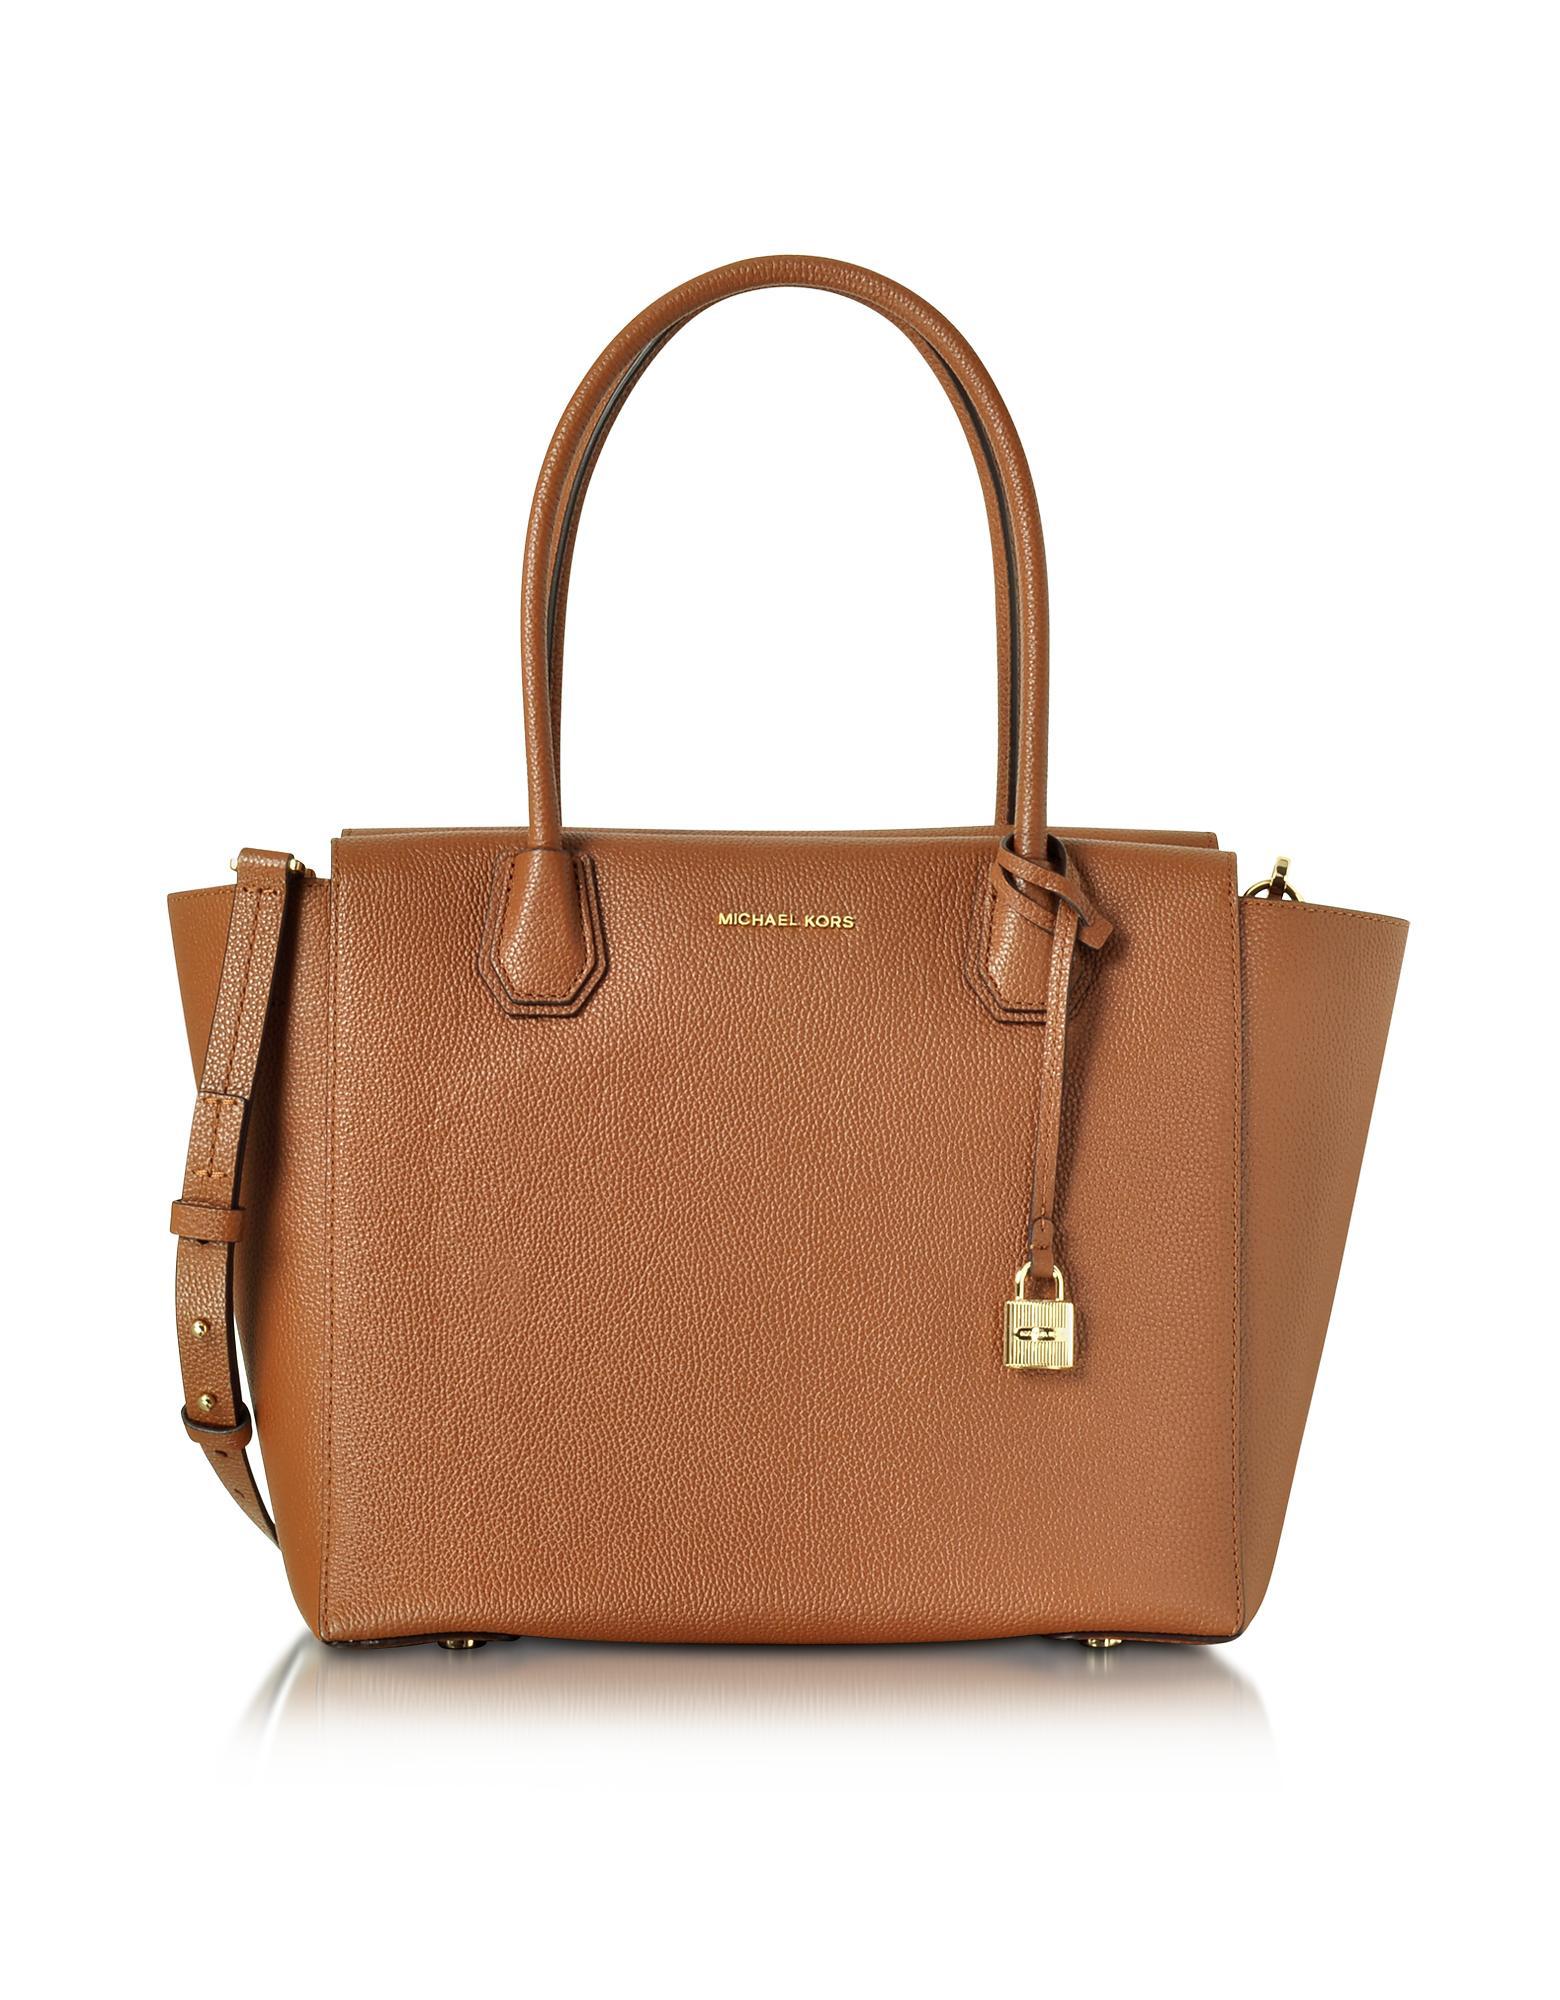 915dbdd630 Michael Kors Mercer Large Luggage Bonded Pebble Leather Satchel in ...